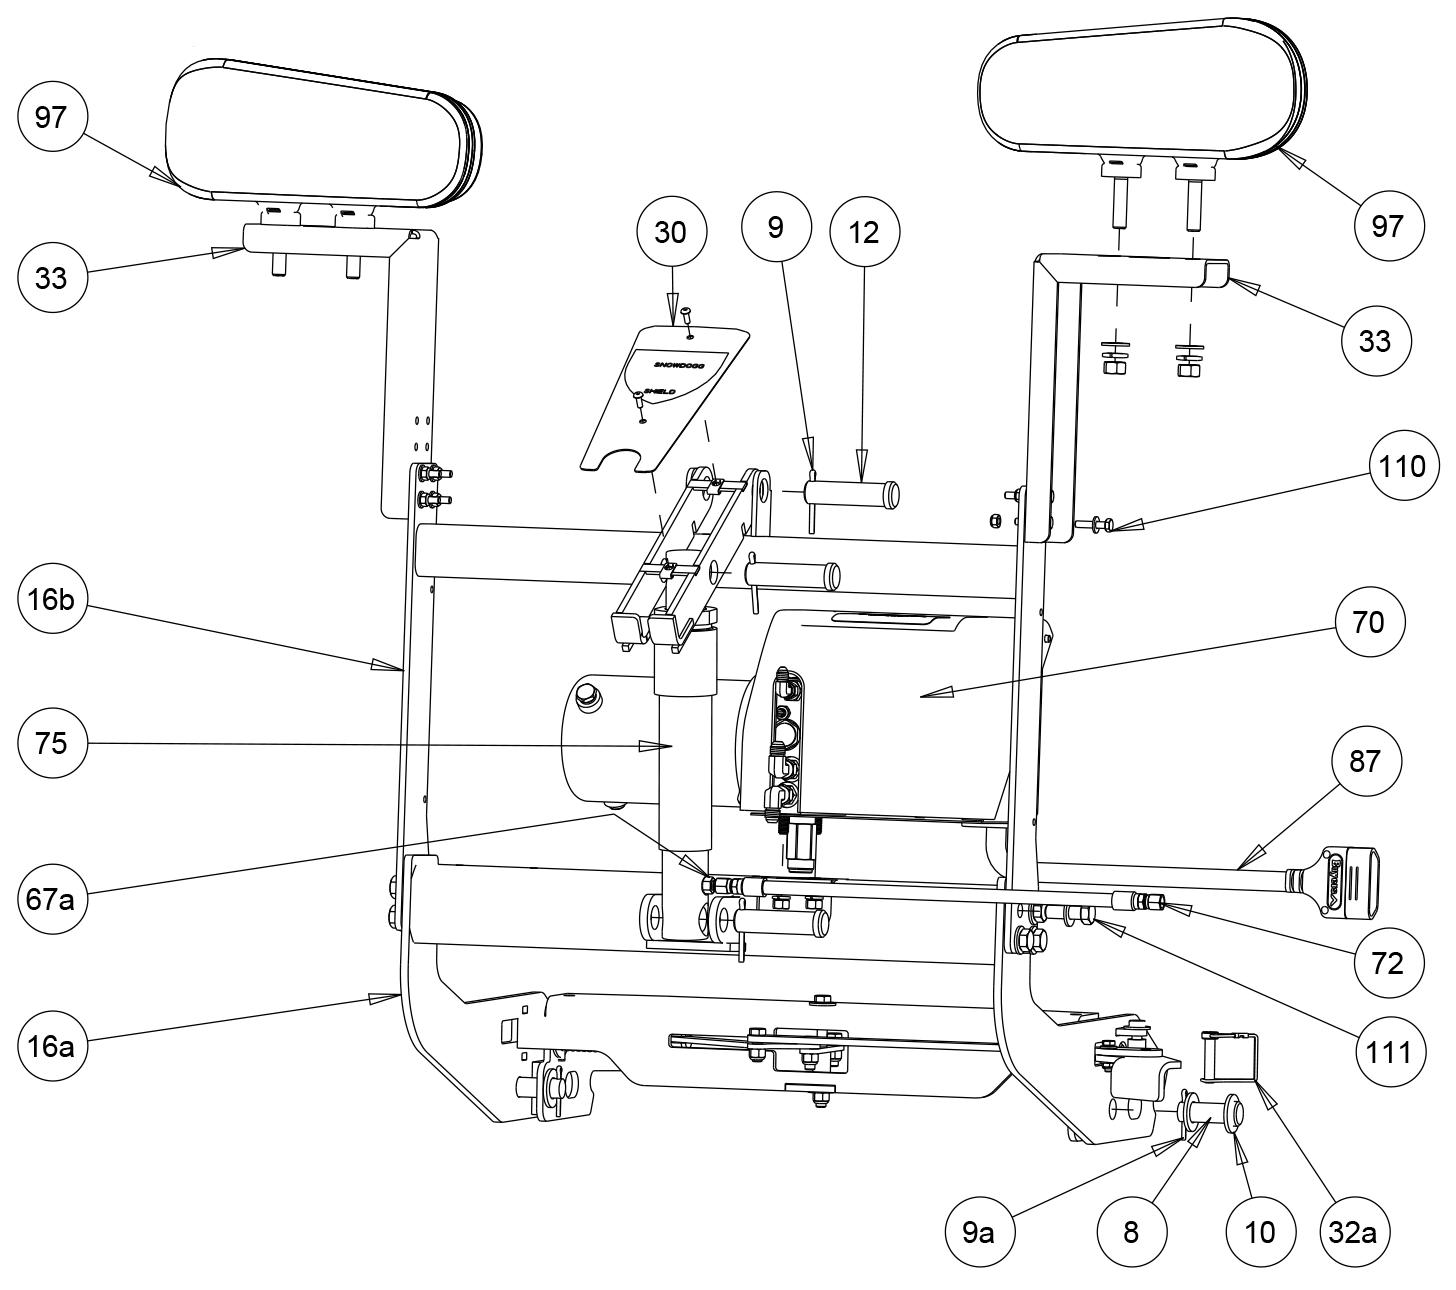 Snow Dog Plow Wiring Diagram Jvc Kd-r320 Wiring Diagram